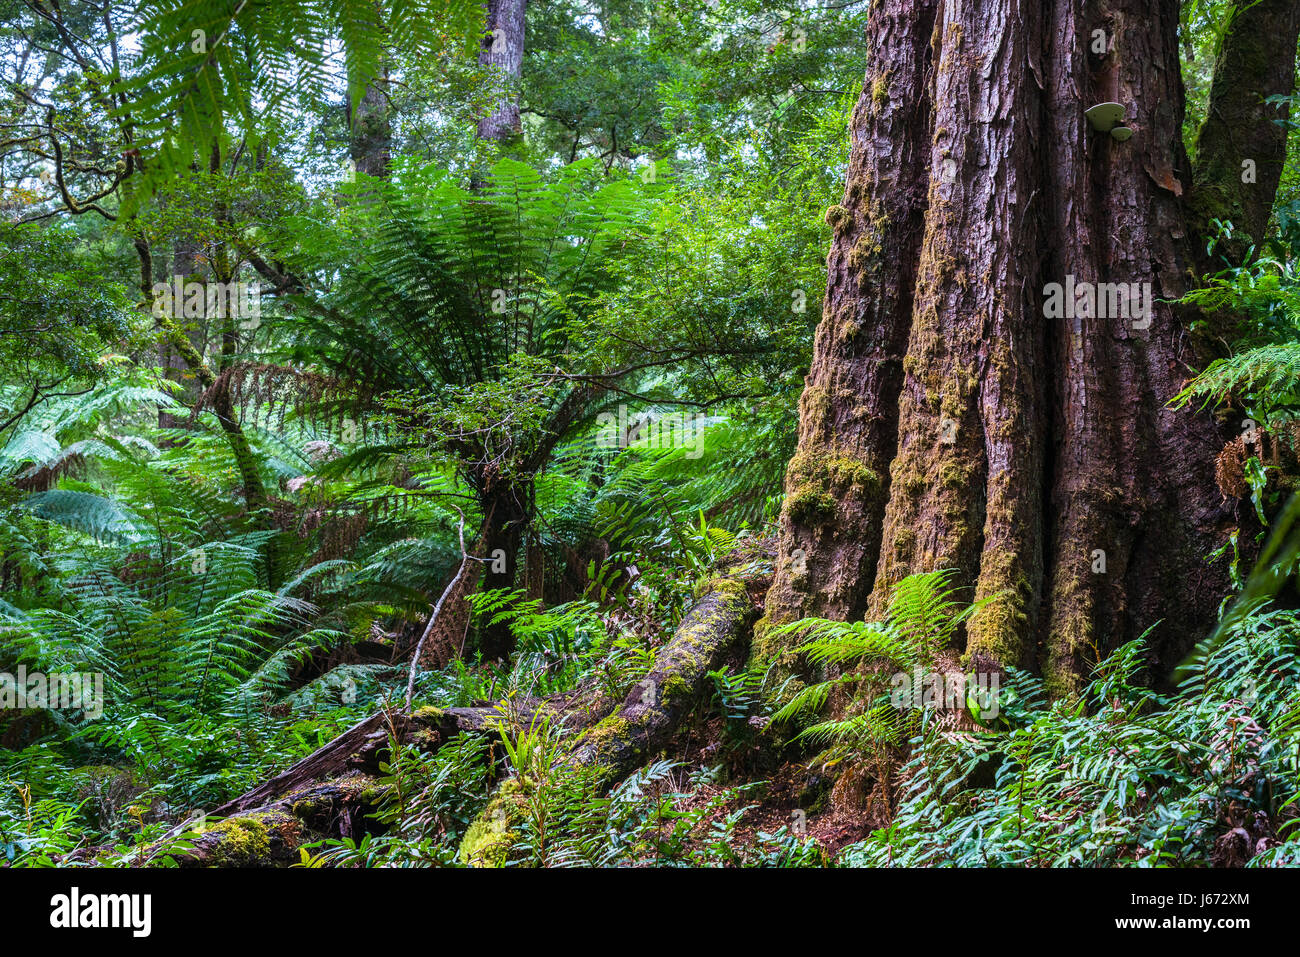 Dicksonia antarctica rain forest en Melba Gully State Park, el Parque Nacional Gran Otway, Victoria, Australia. Imagen De Stock